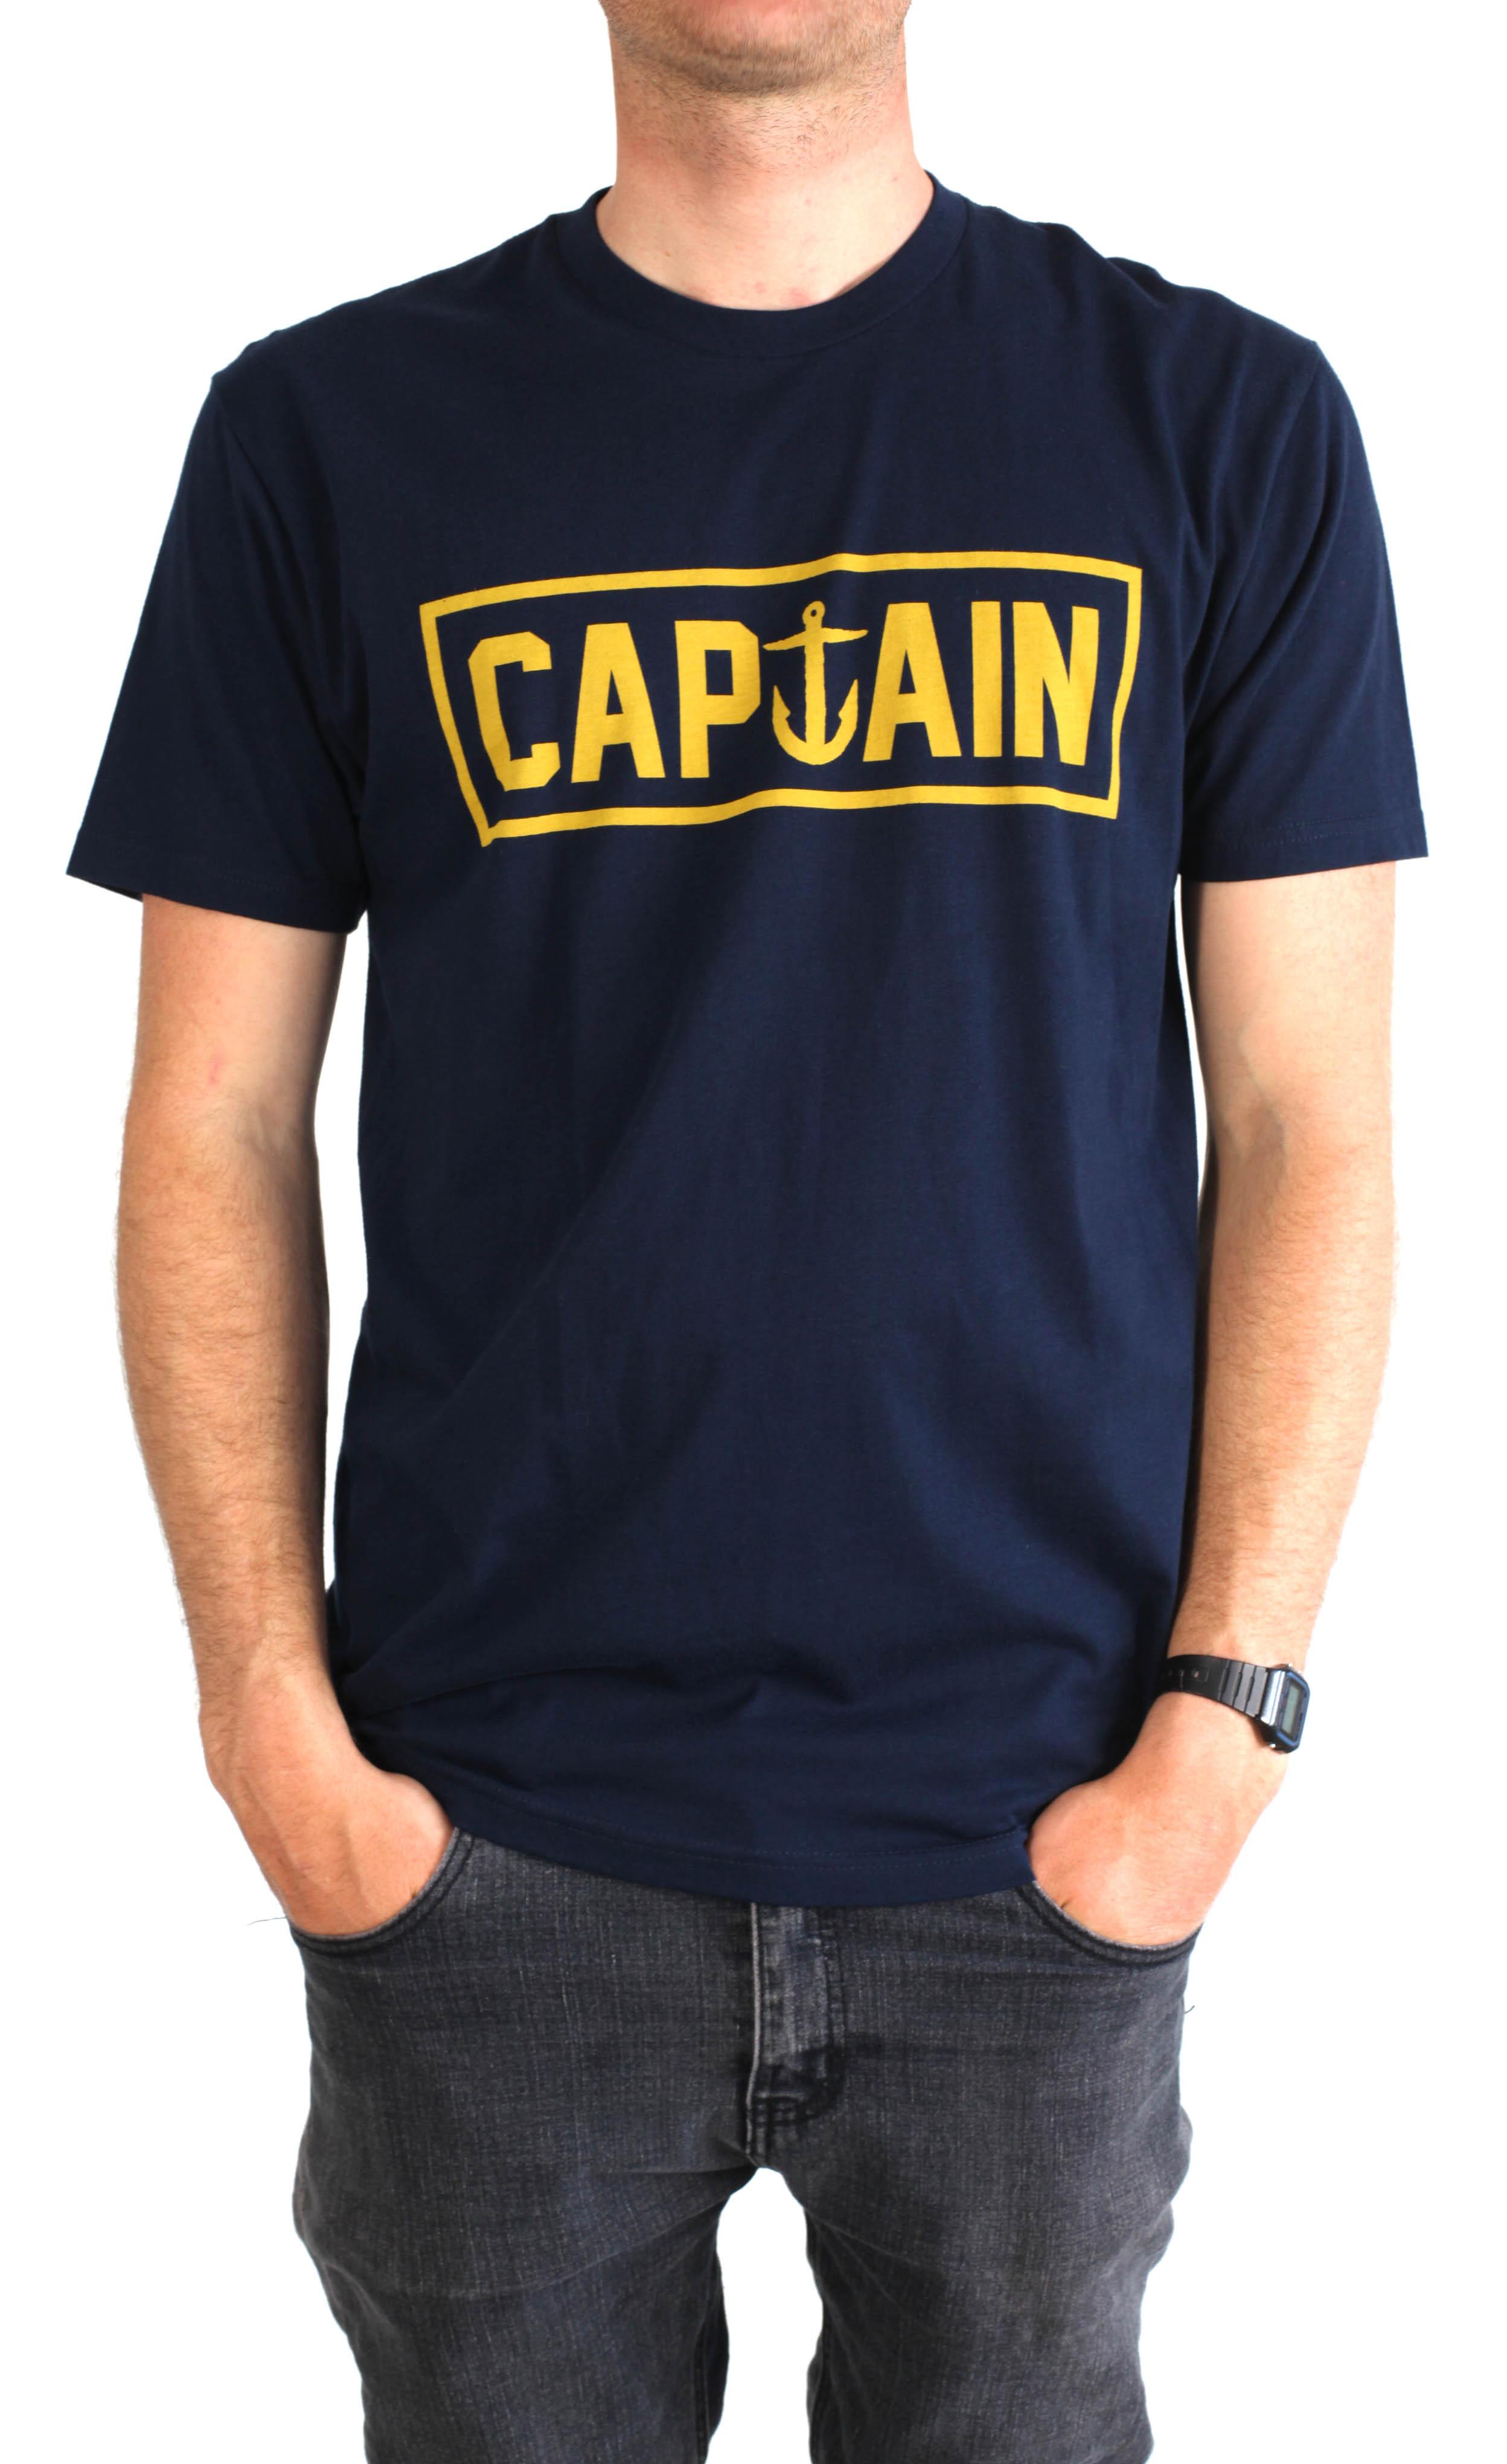 f58090b71 CAPTAIN FIN CO. CAPTAIN TEE